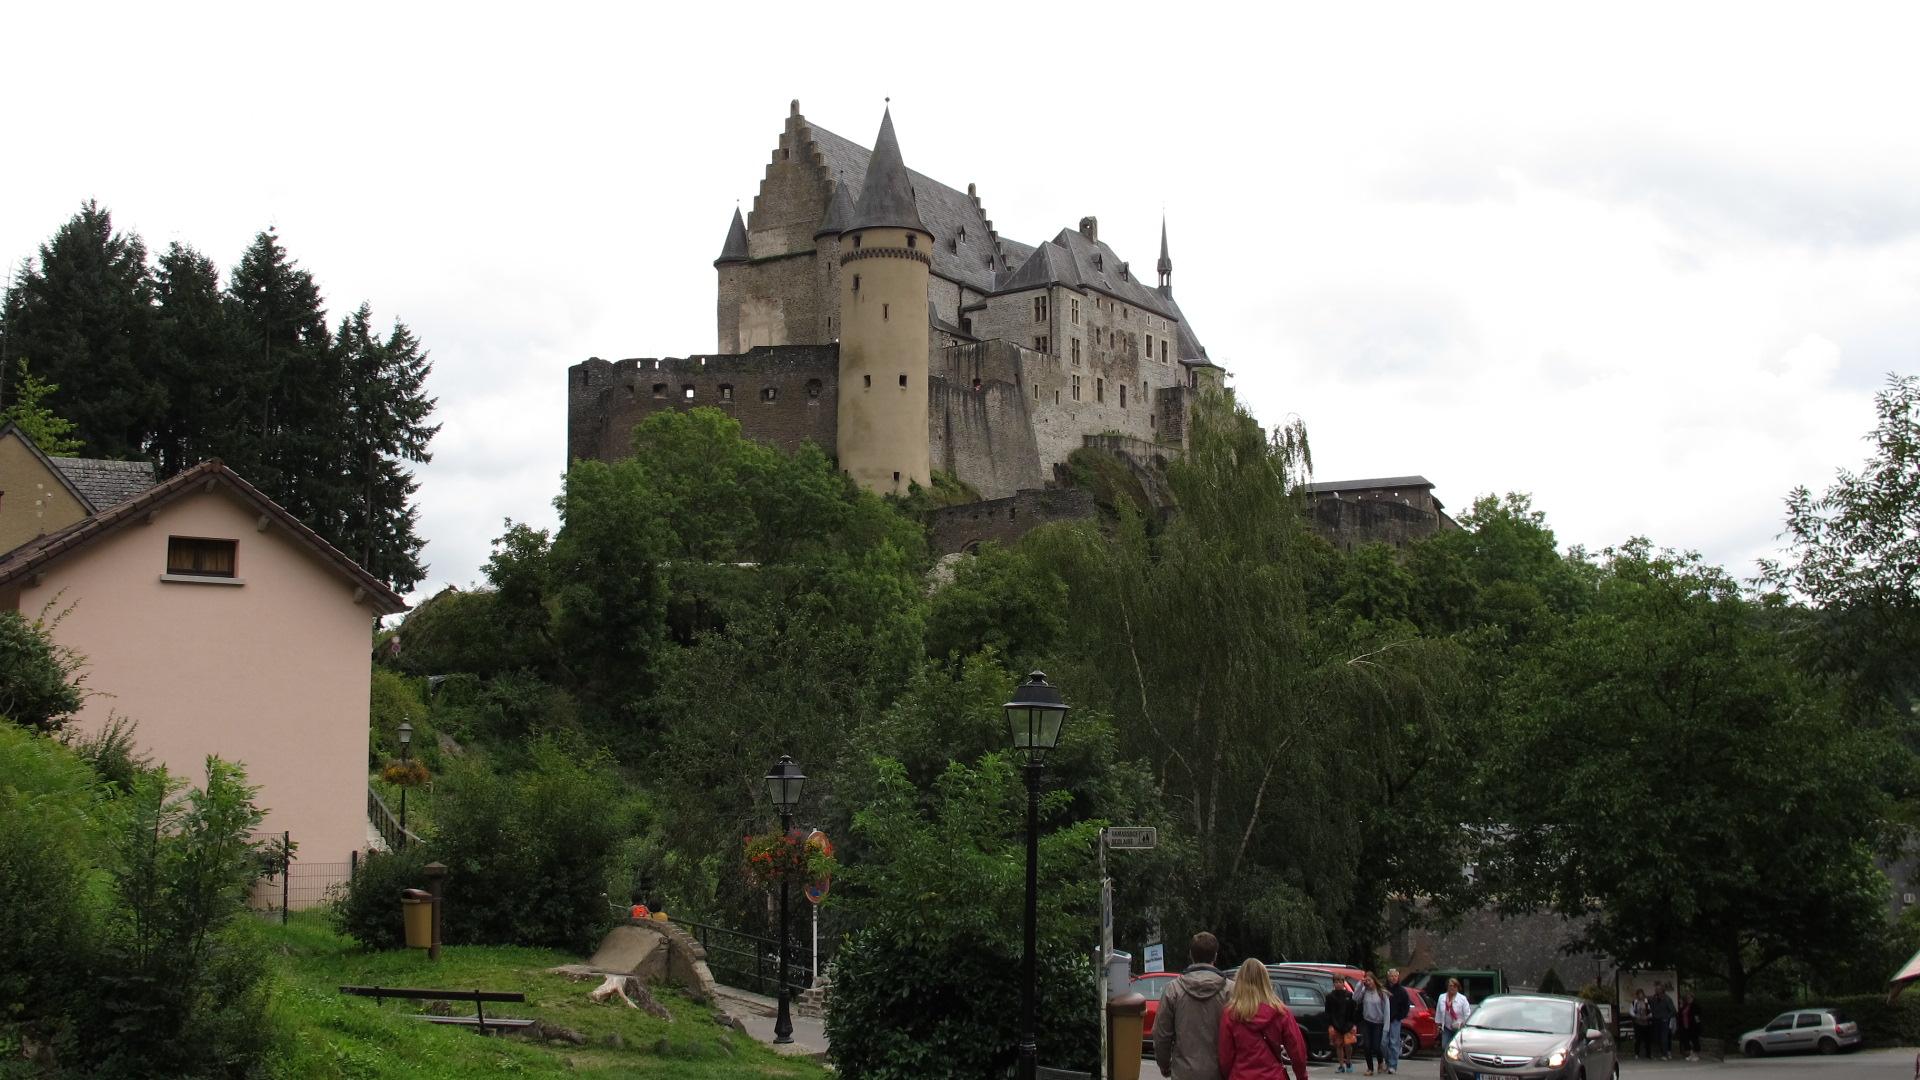 luxemburg-august-2014-022.jpg